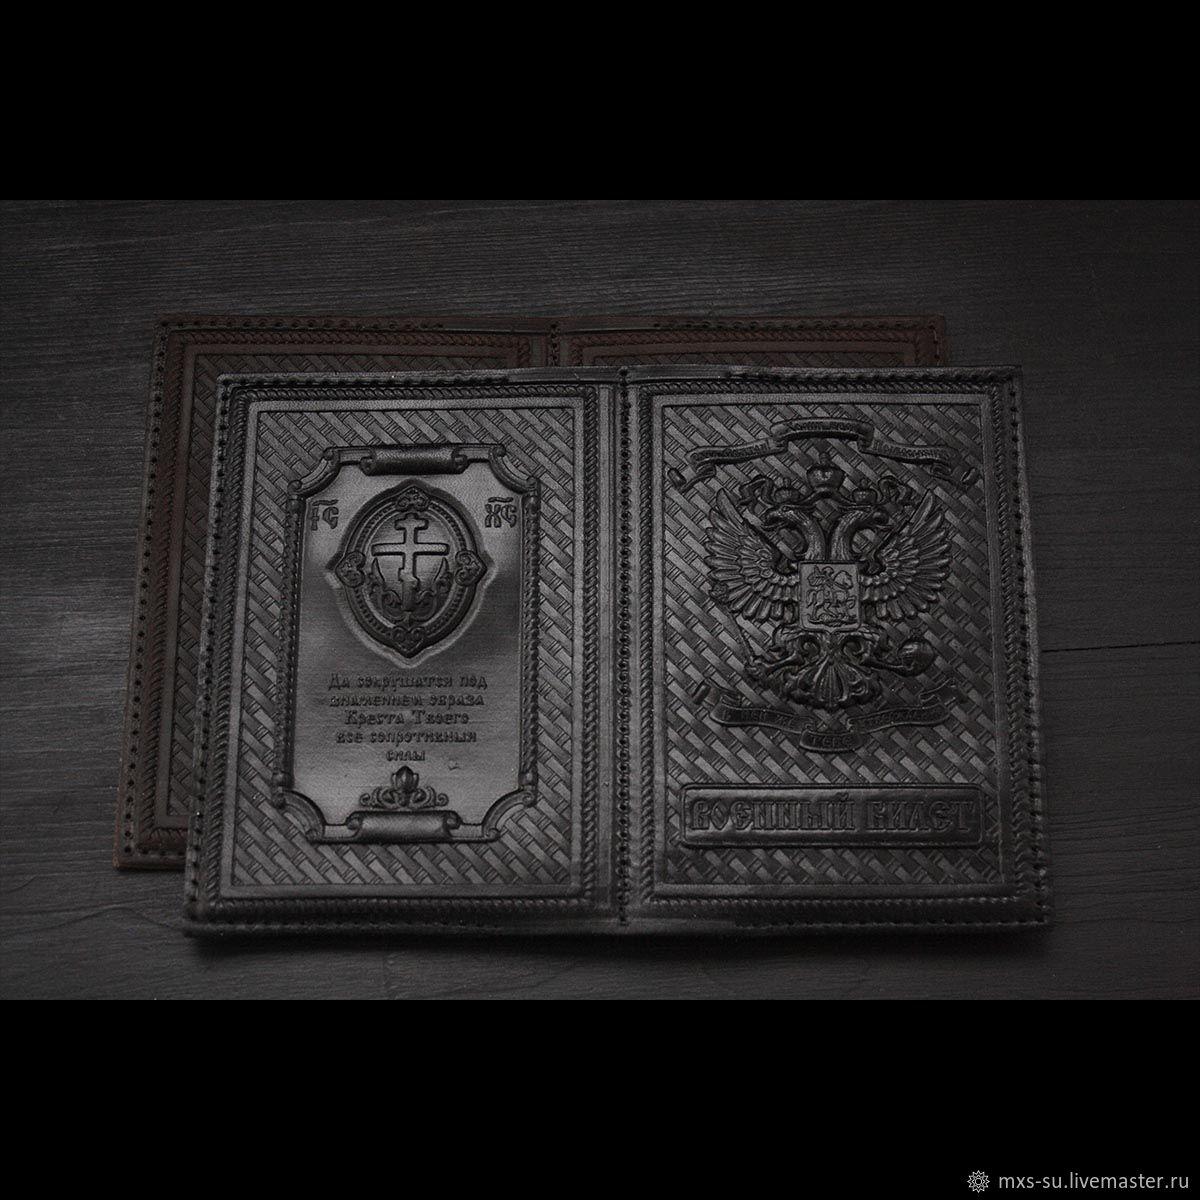 Обложка на военный билет, Обложки, Тюмень,  Фото №1